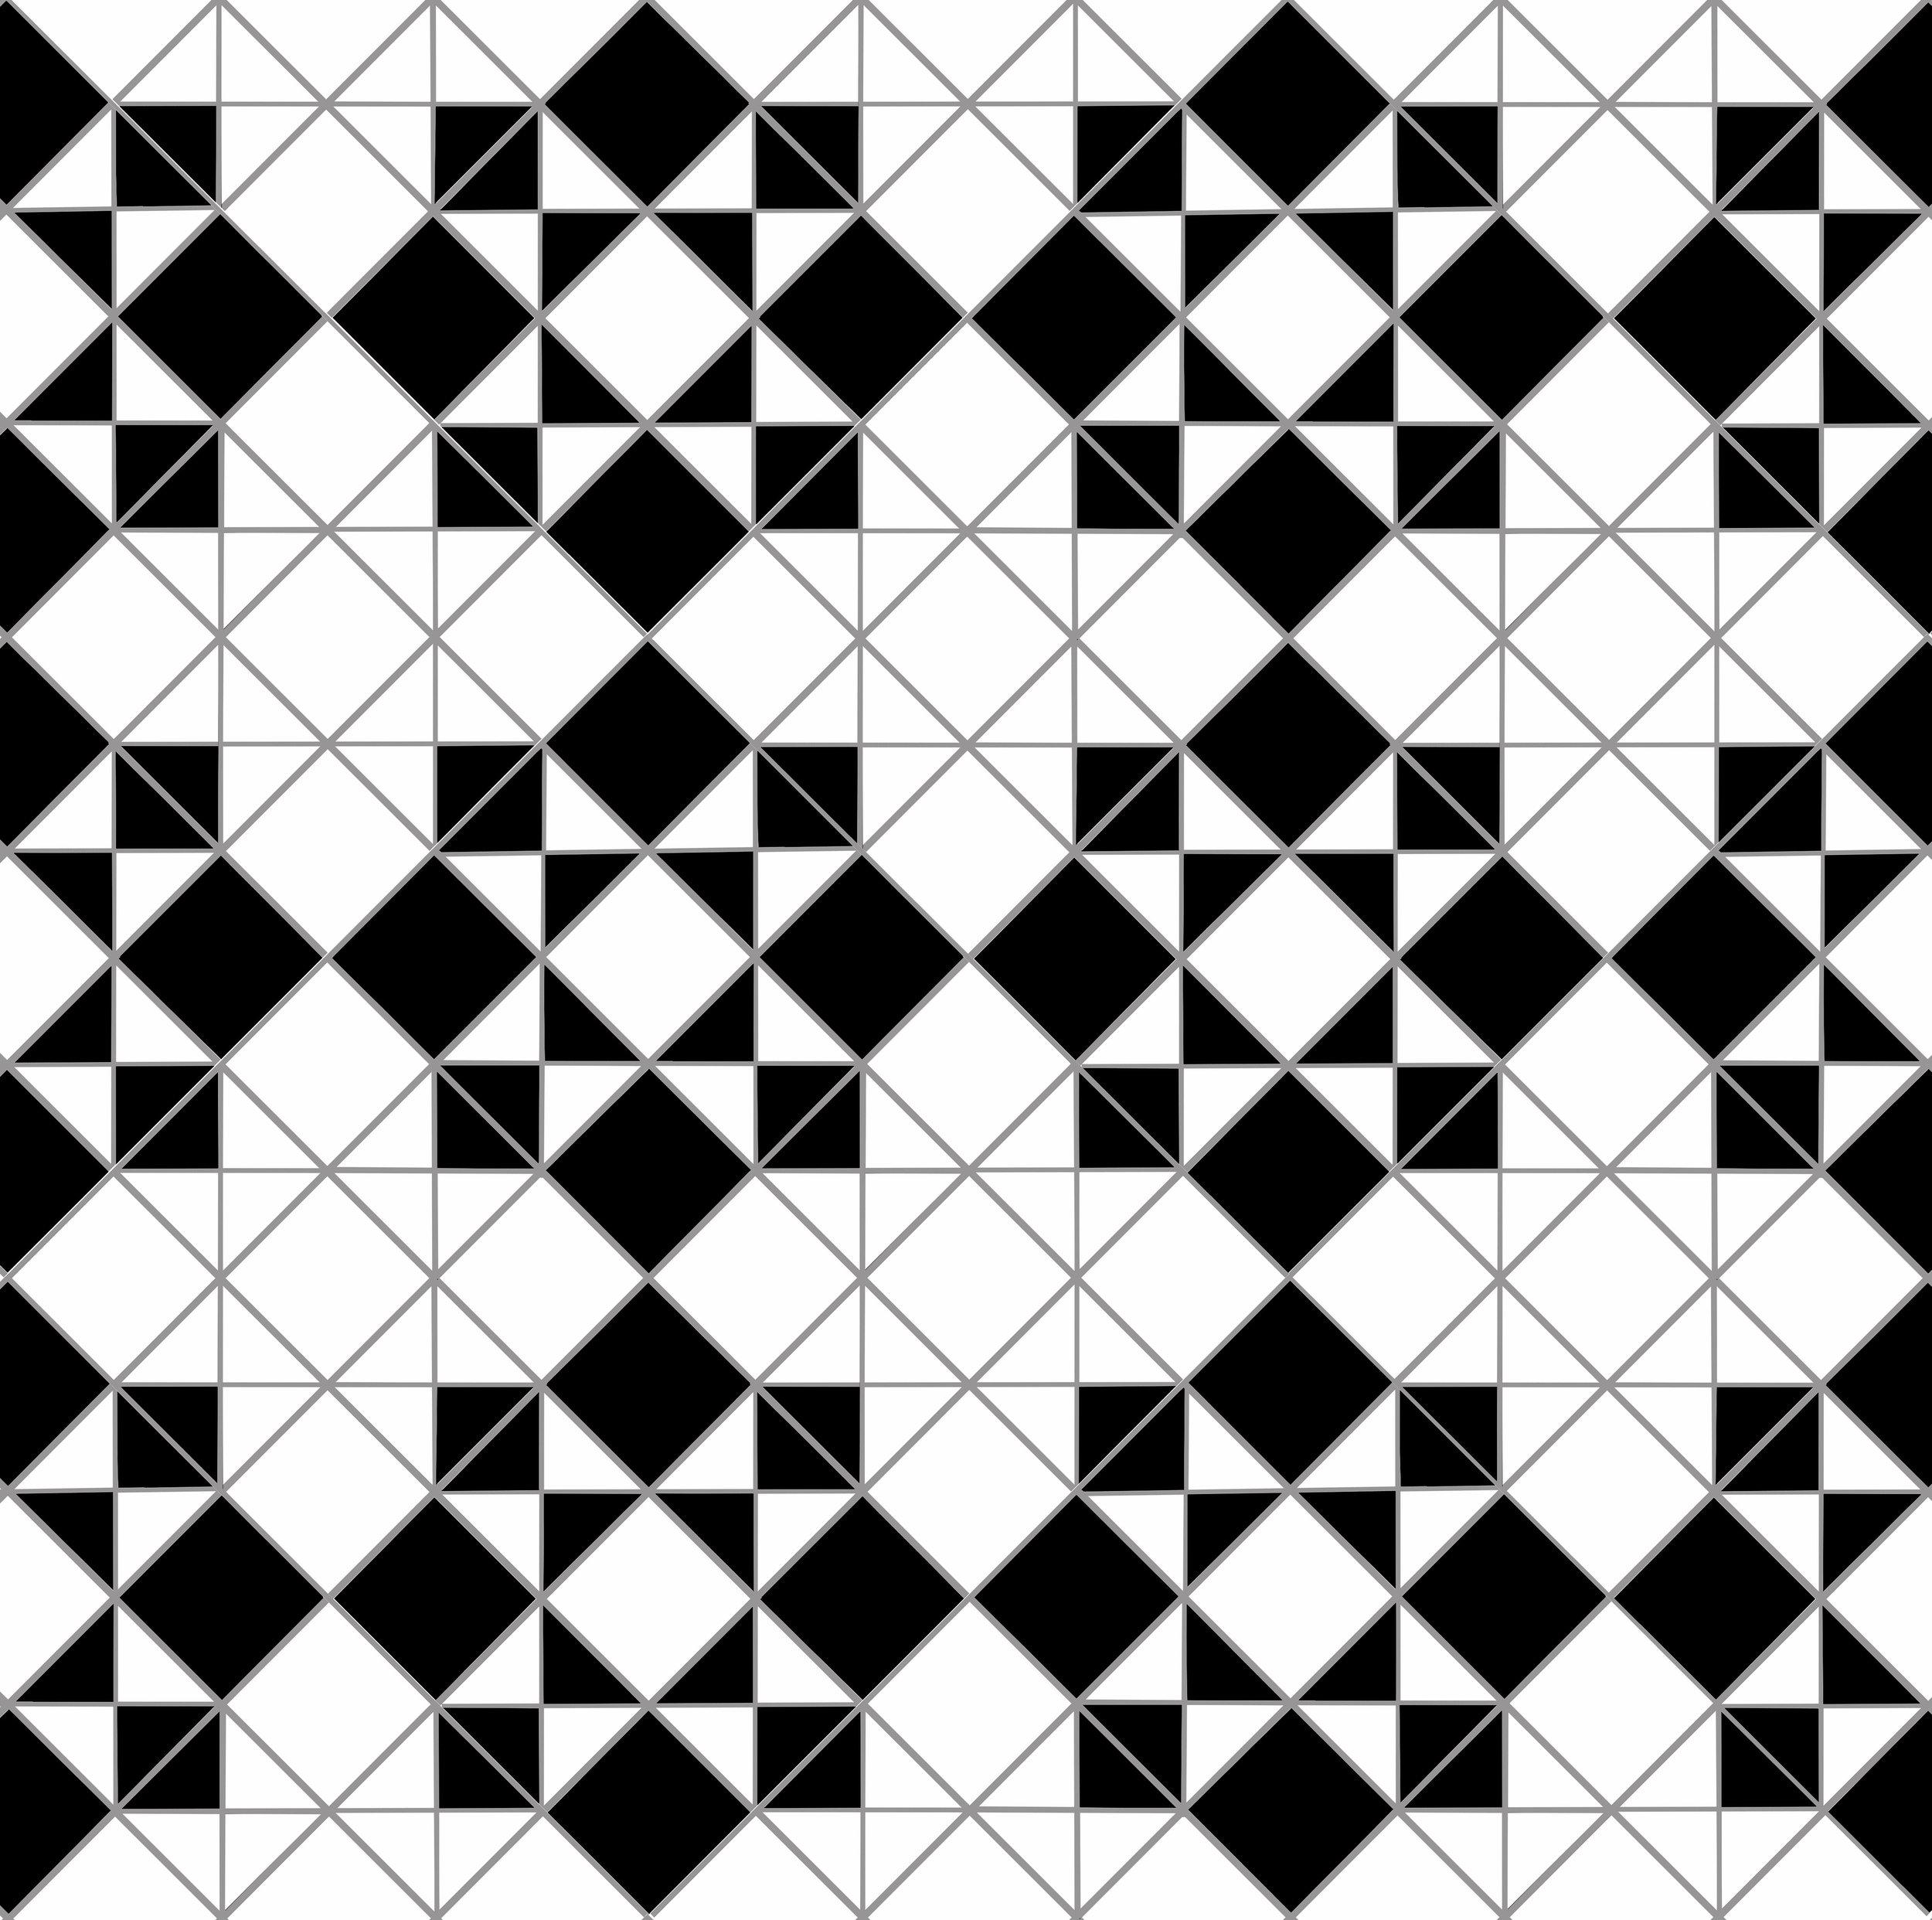 Starry Tesselation black.jpg